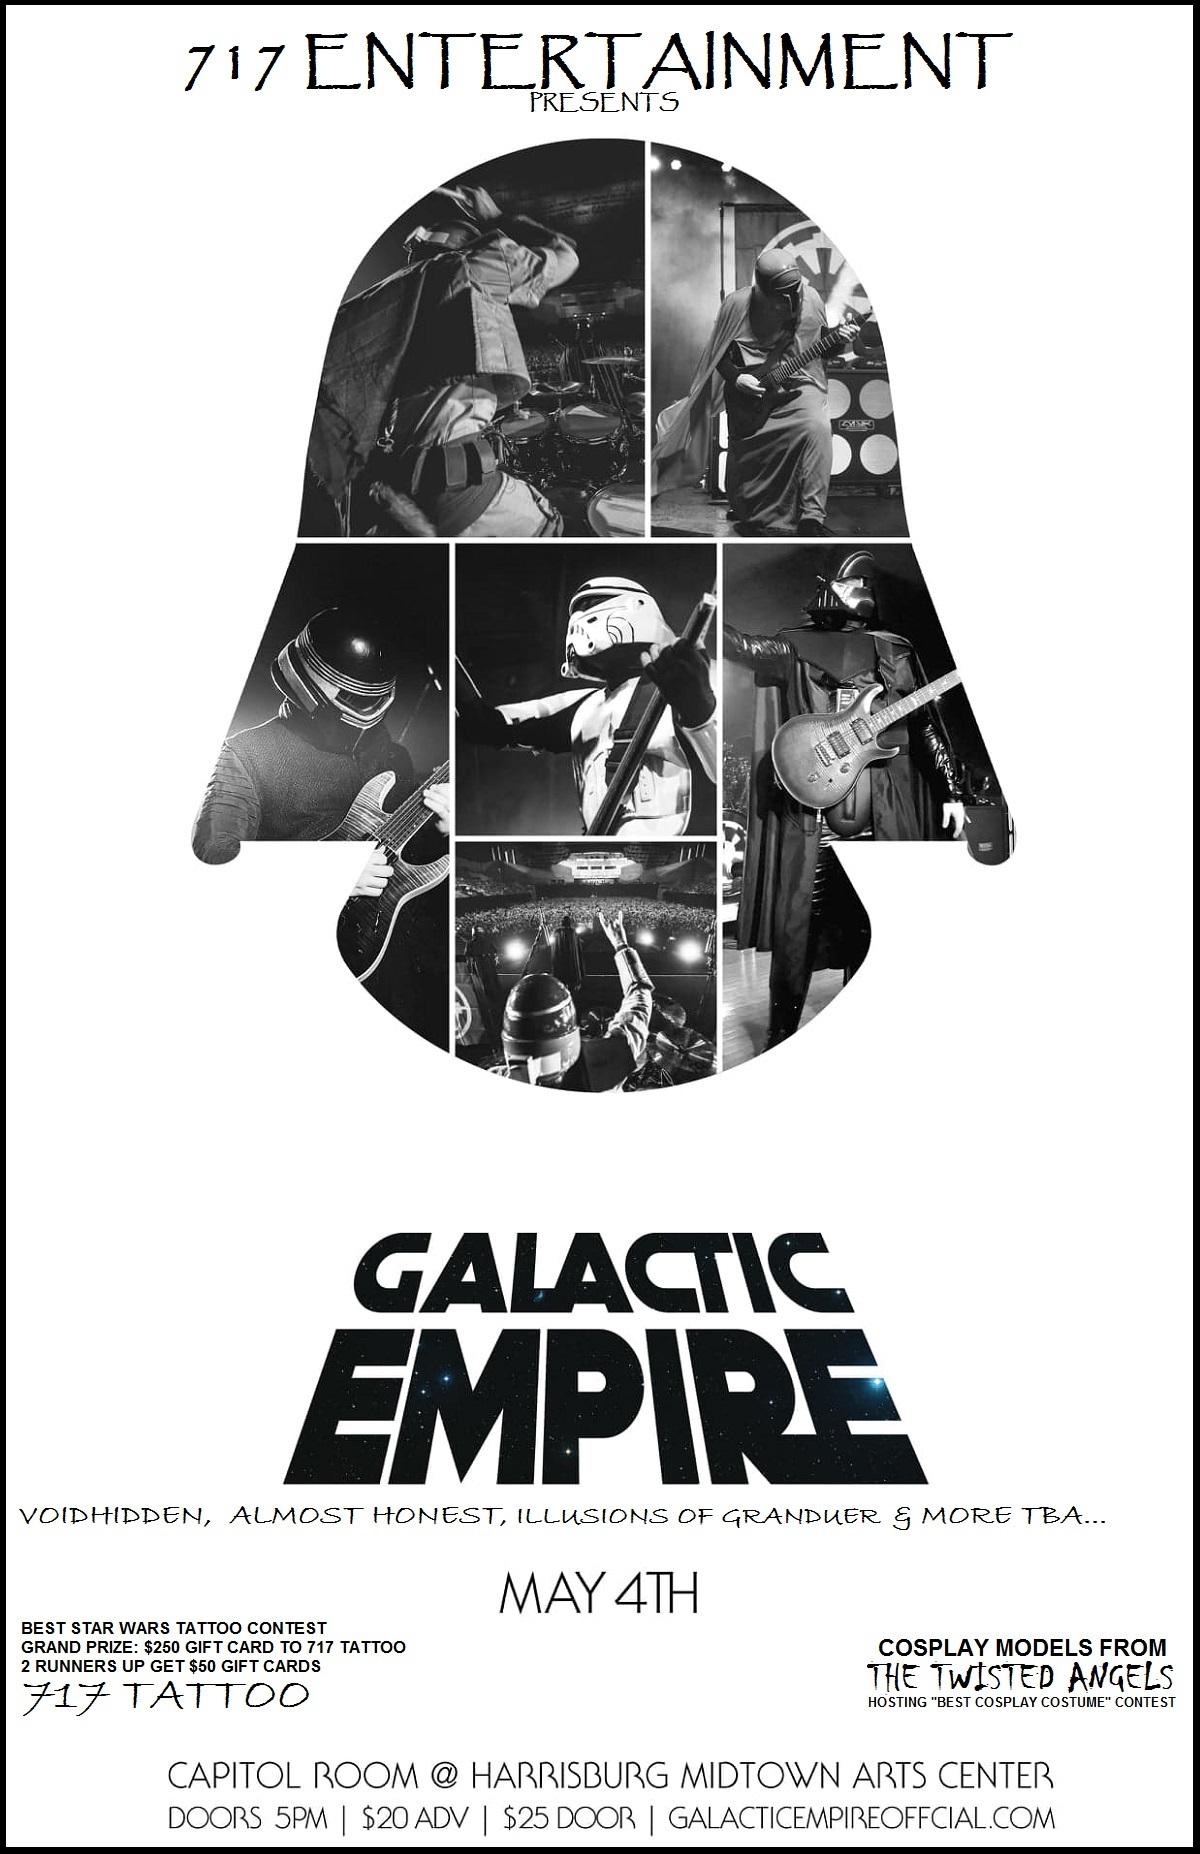 Galactic Empire Offiical.jpg